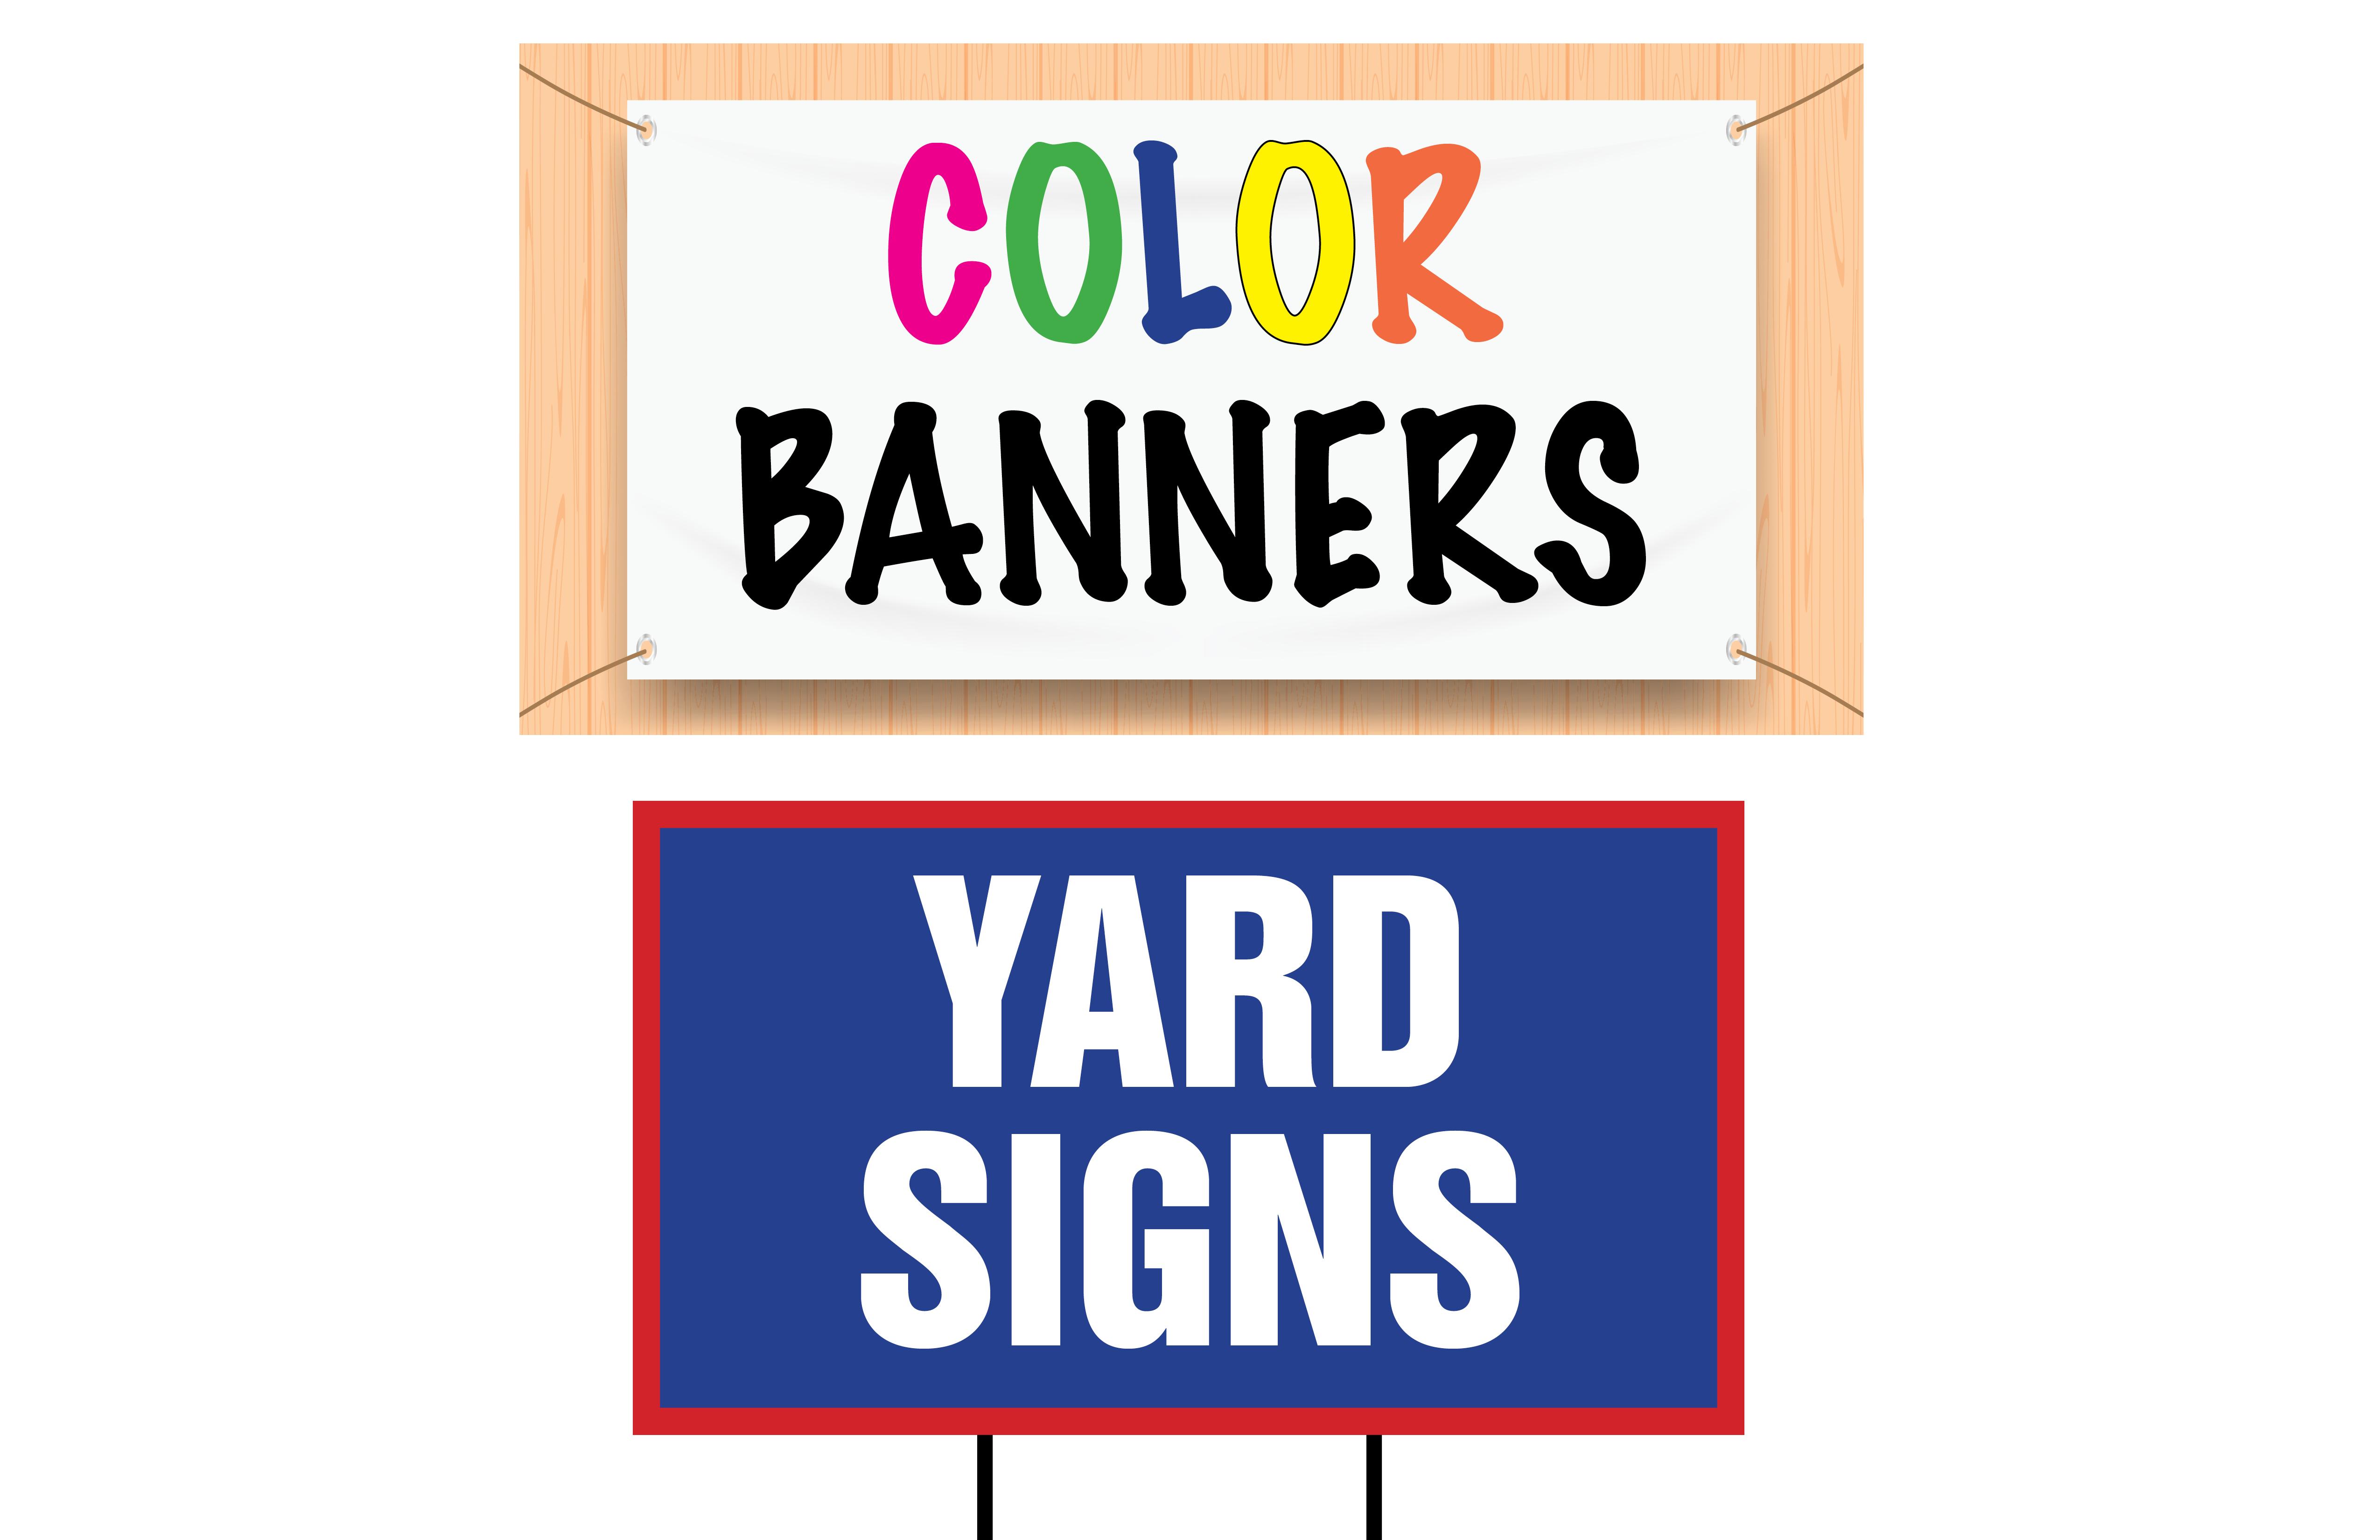 Vinyl Banners & Coroplast Signs